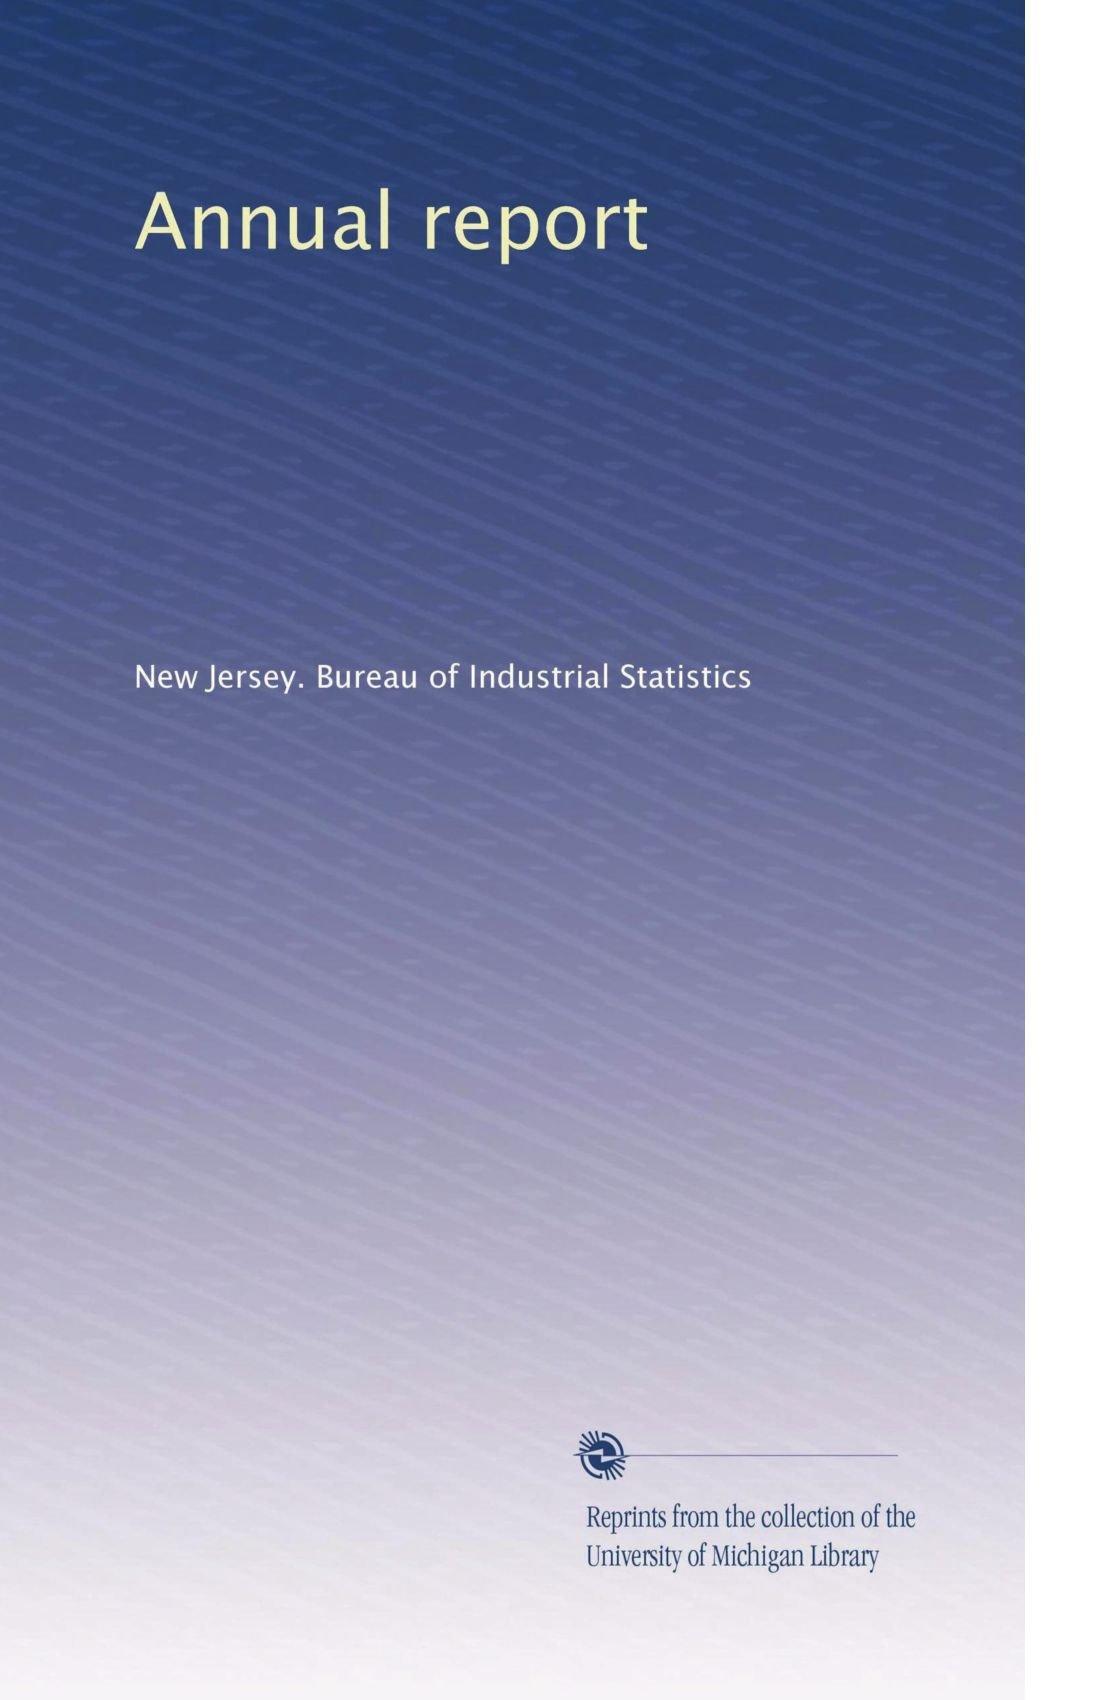 Annual report (Volume 7) pdf